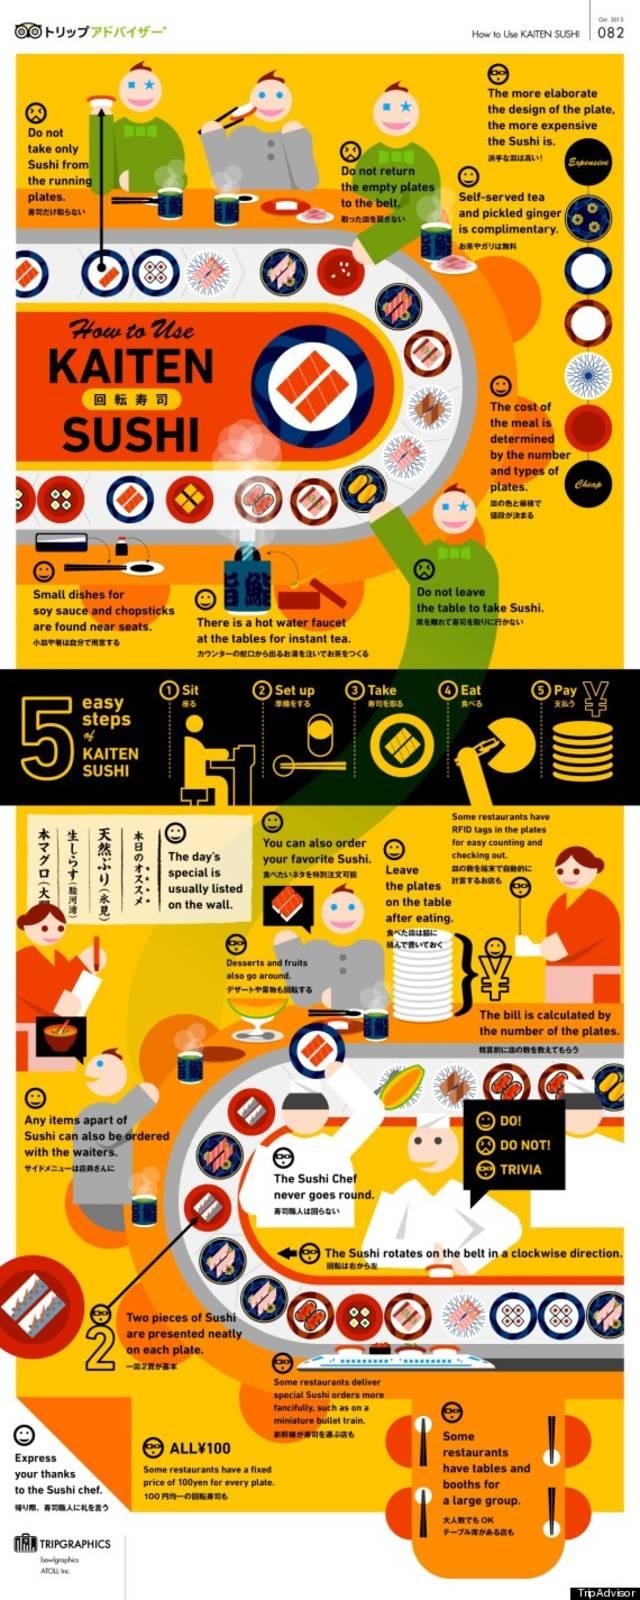 O infographic kaitensushi 570